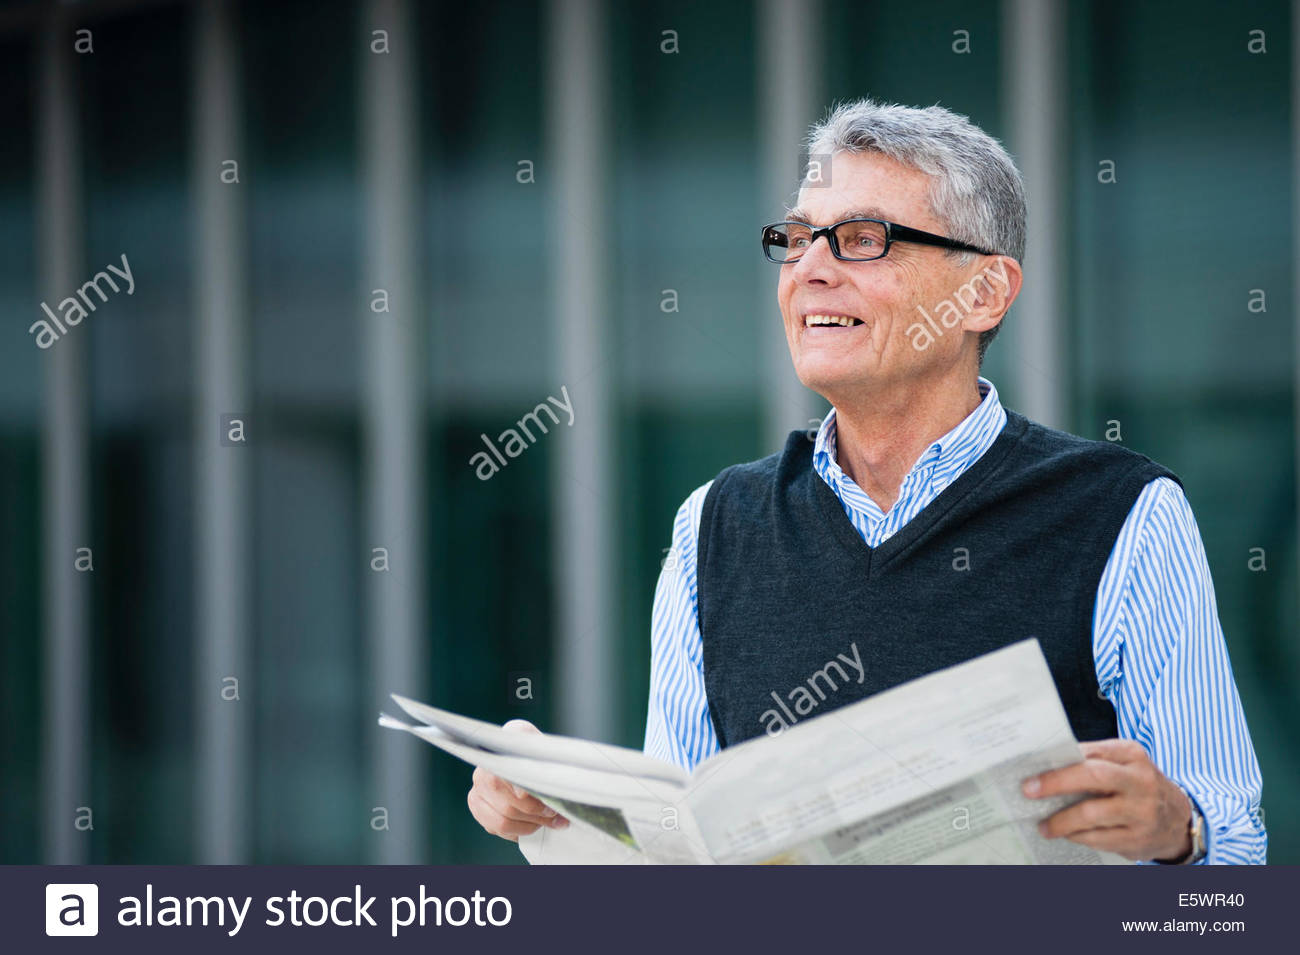 Senior adult businessman making notes on plan - Stock Image